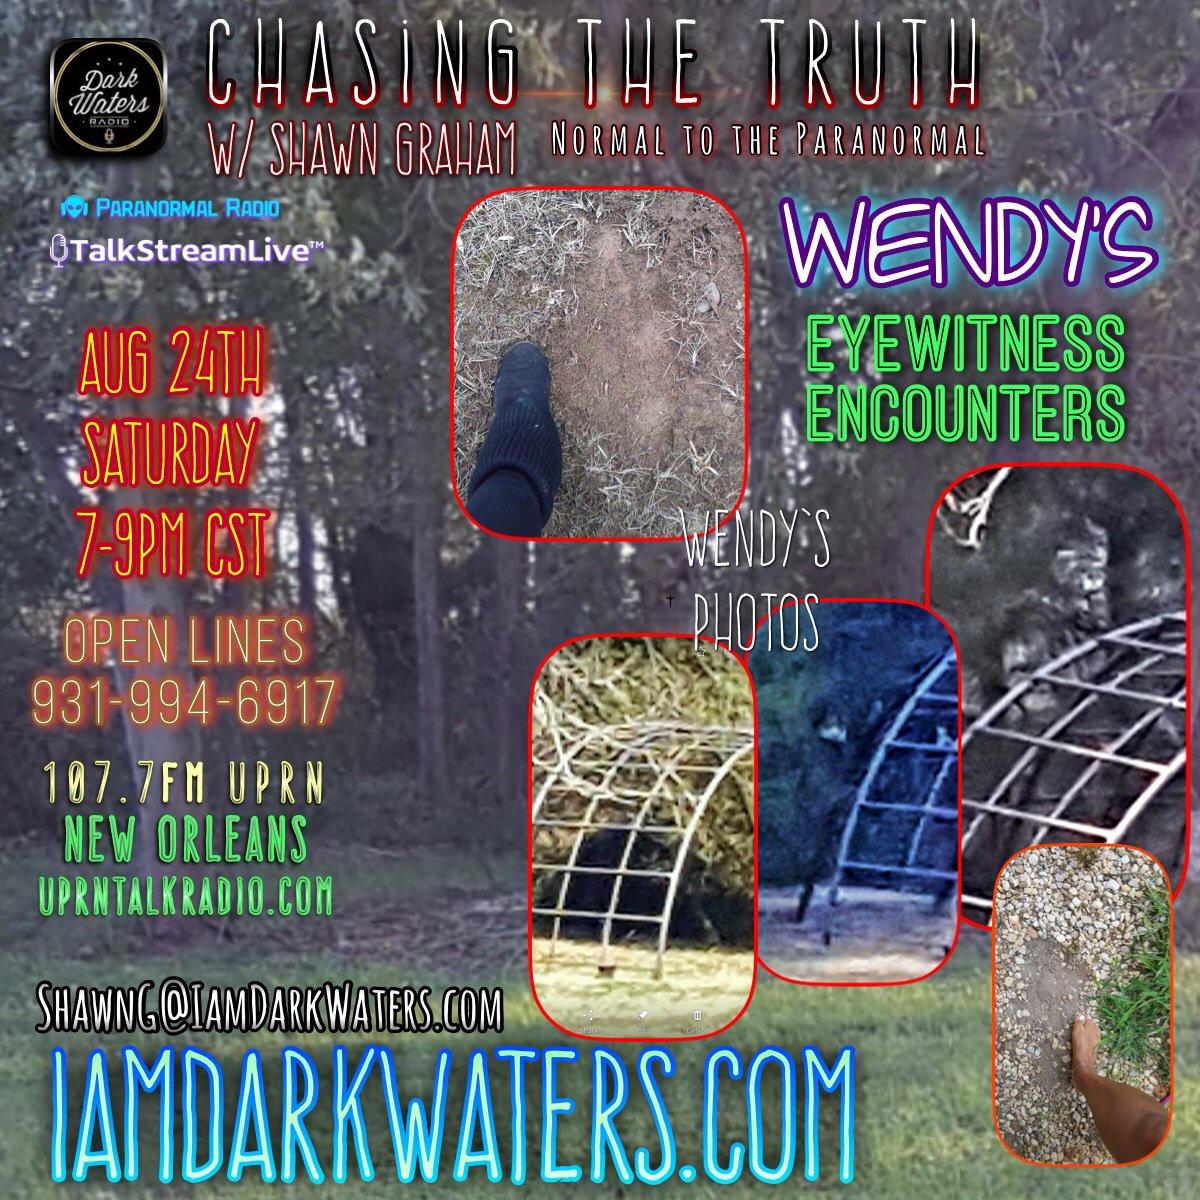 Chasing The Truth w/ Shawn G August 24 7-9pm cst Eyewitness encounters. Shawn & Wendy discuss her photos Saturday! iamdarkwaters.com Uprntalkradio.com #eyewitnessEncounters #paranormal #sasquatch #bigfoot #cryptid #podcast #ChasingTheTruth #DarkWatersRadio #share